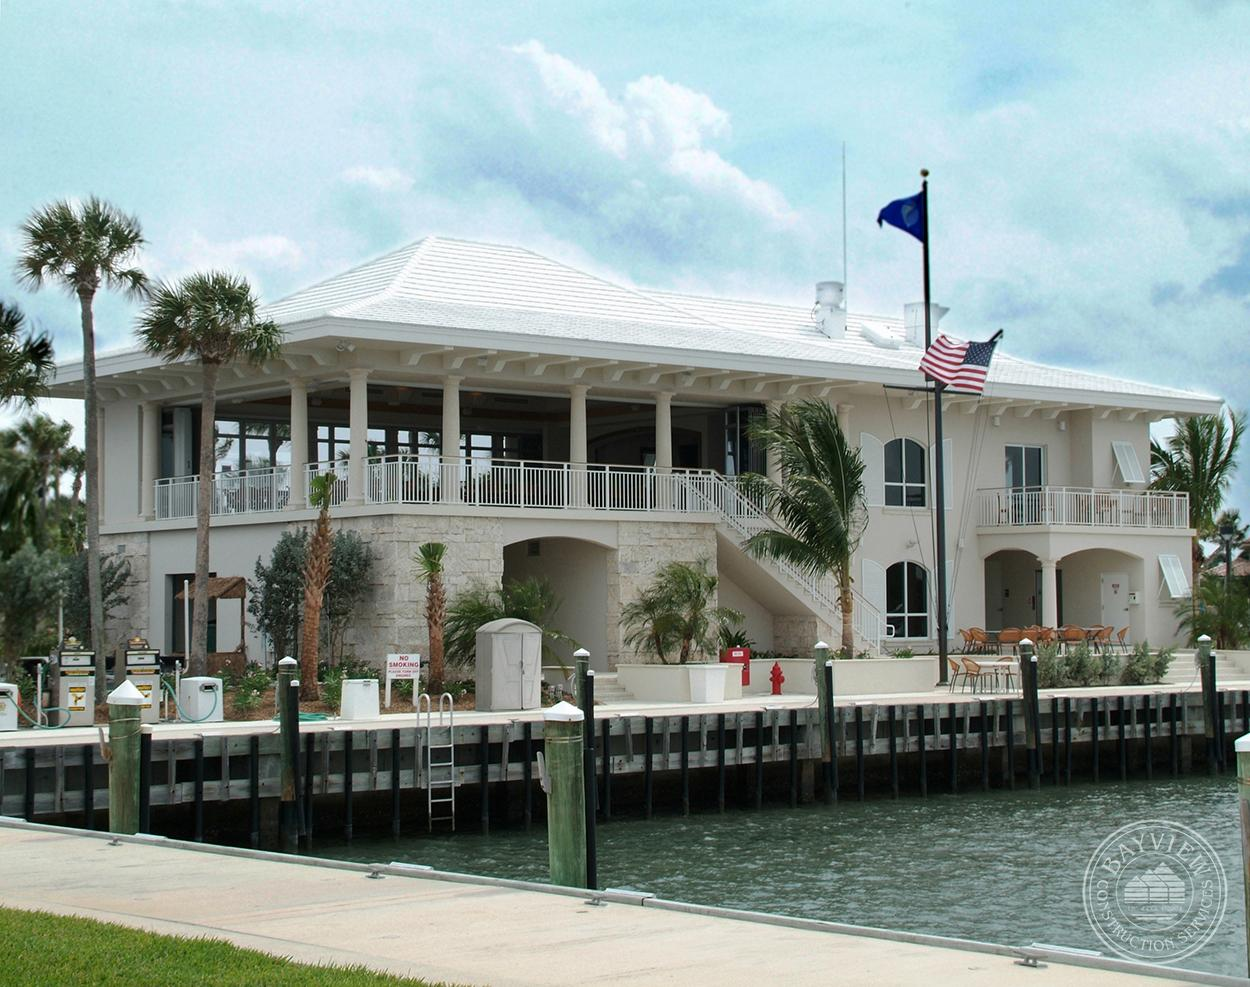 Exterior overlooking the water Sailfish Point Marina & Yacht Club Hutchinson Island, FL